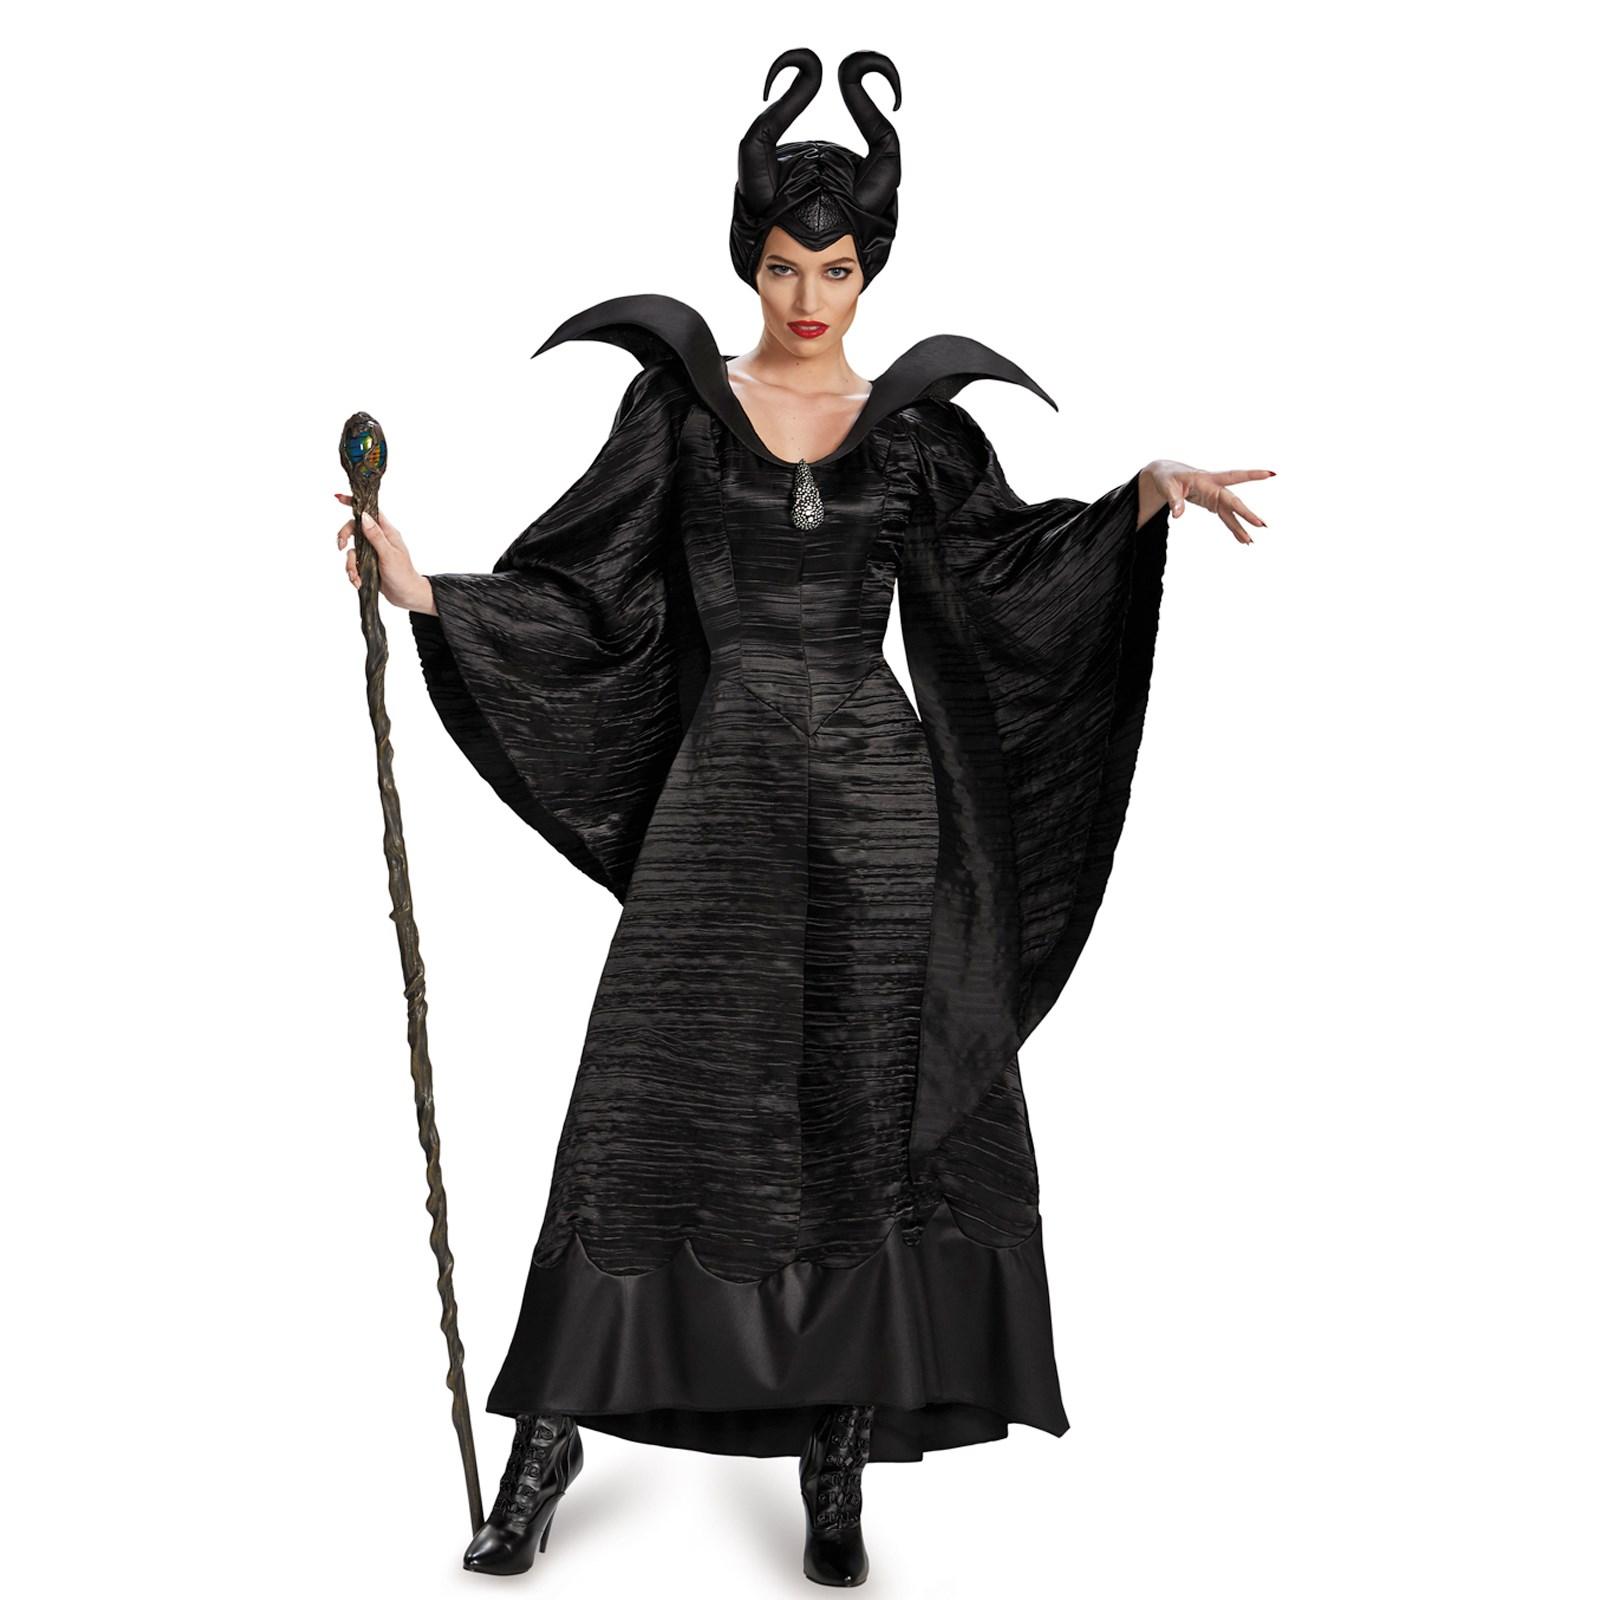 「Maleficent costumes」の画像検索結果